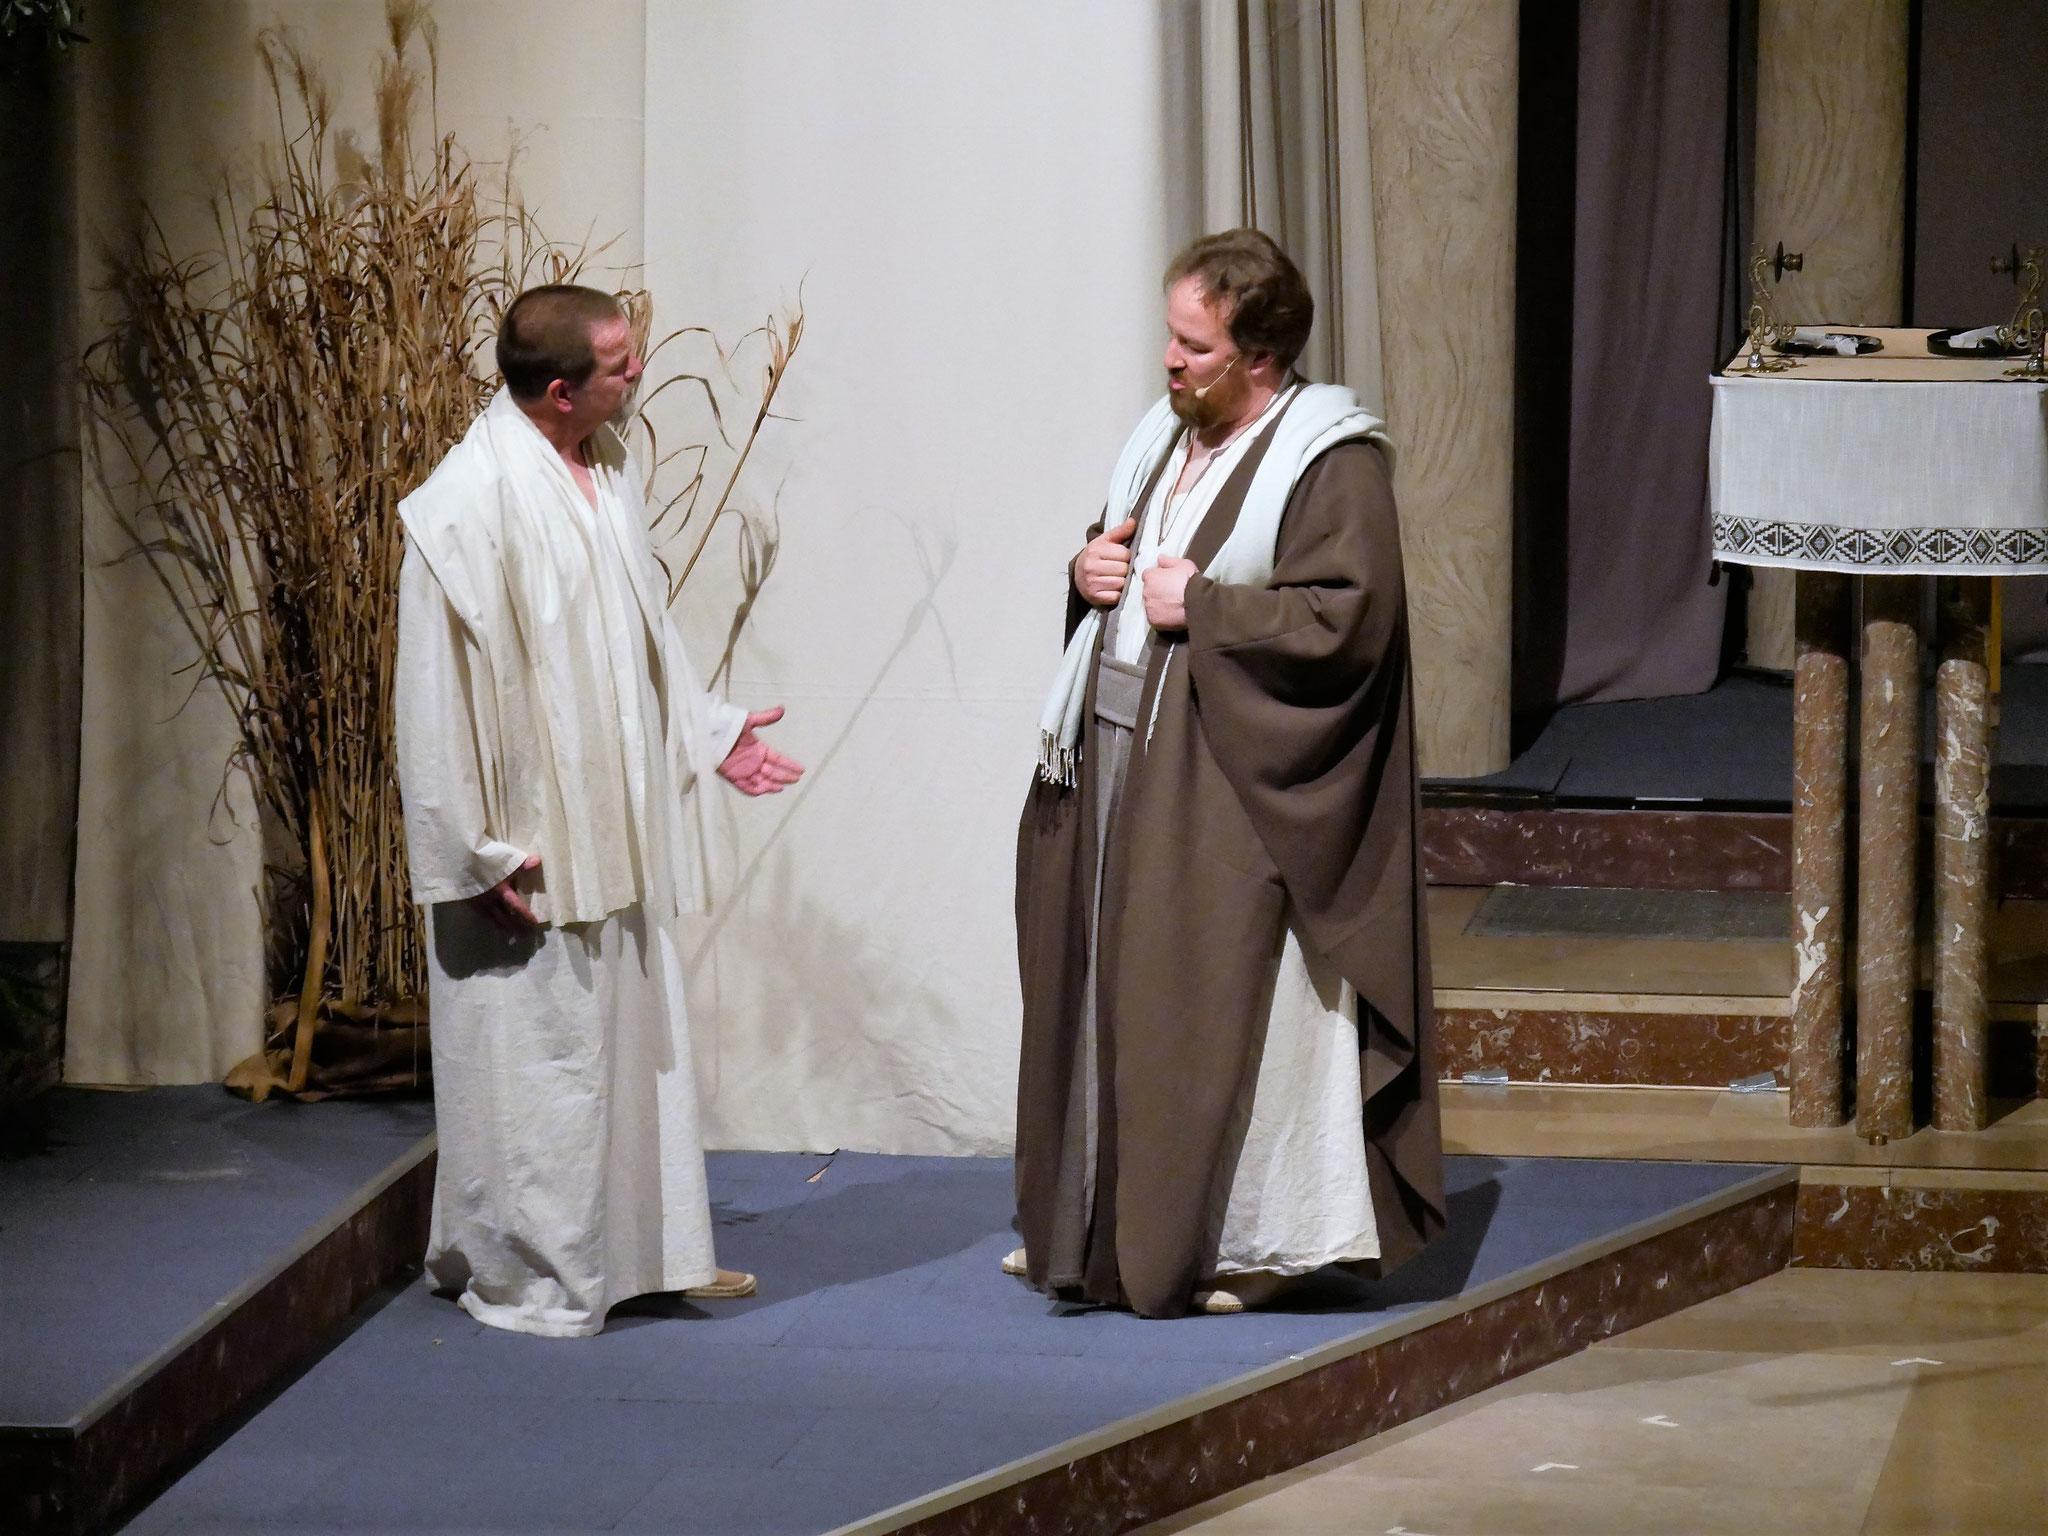 Judas trifft Zerah